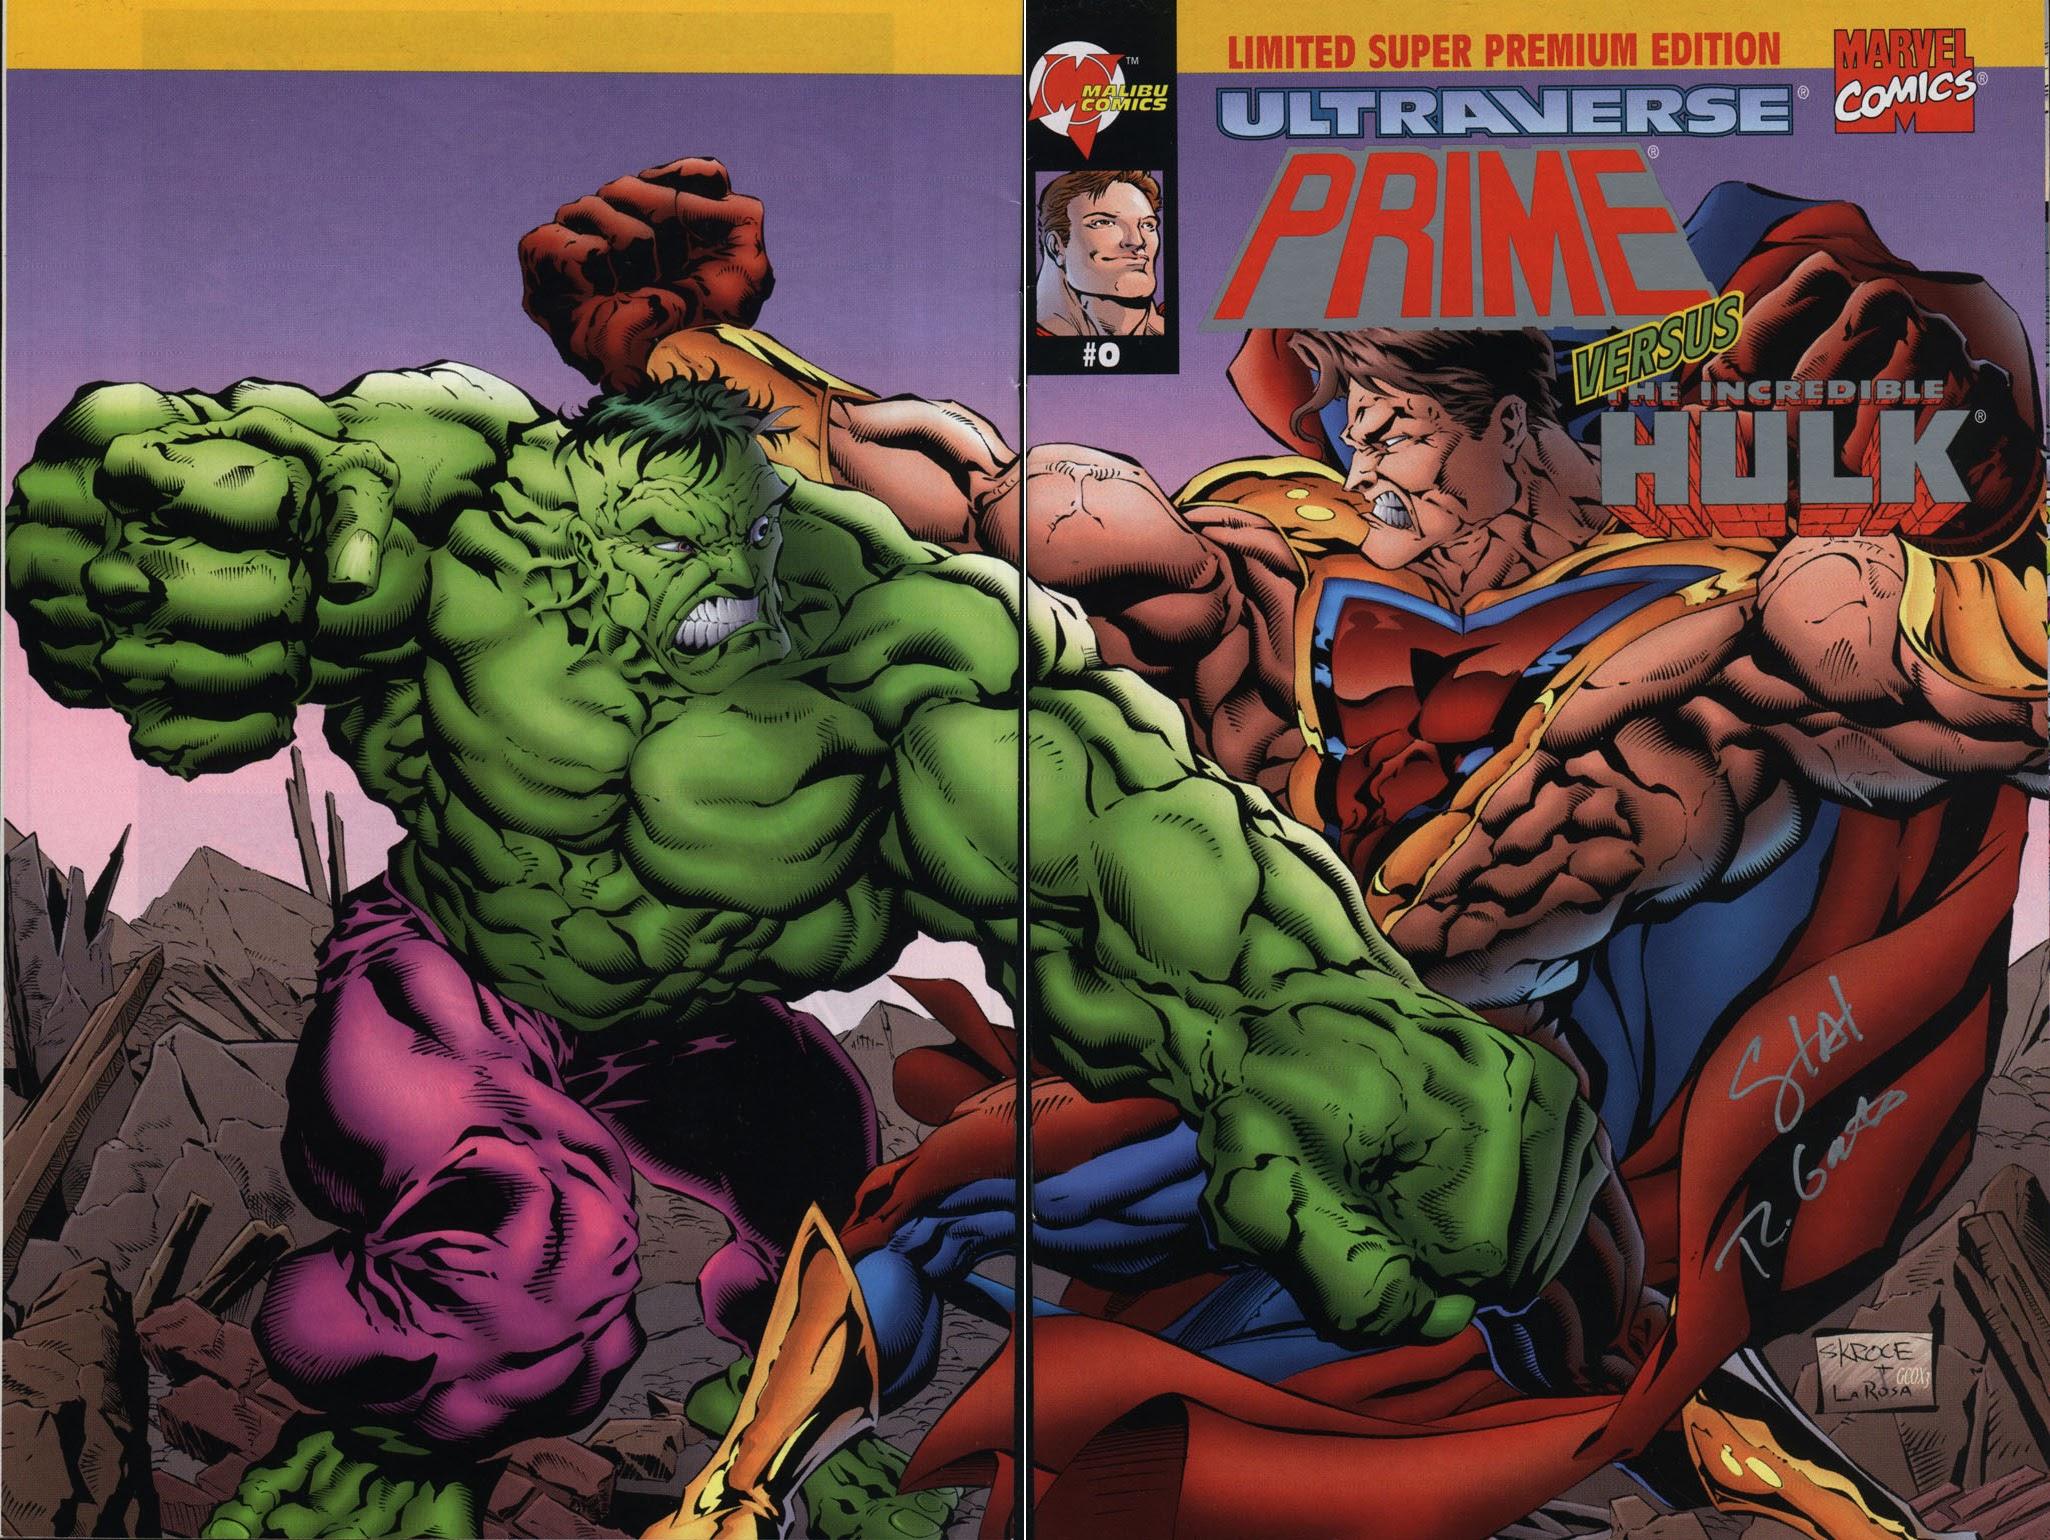 Prime Vs. The Incredible Hulk Full Page 1